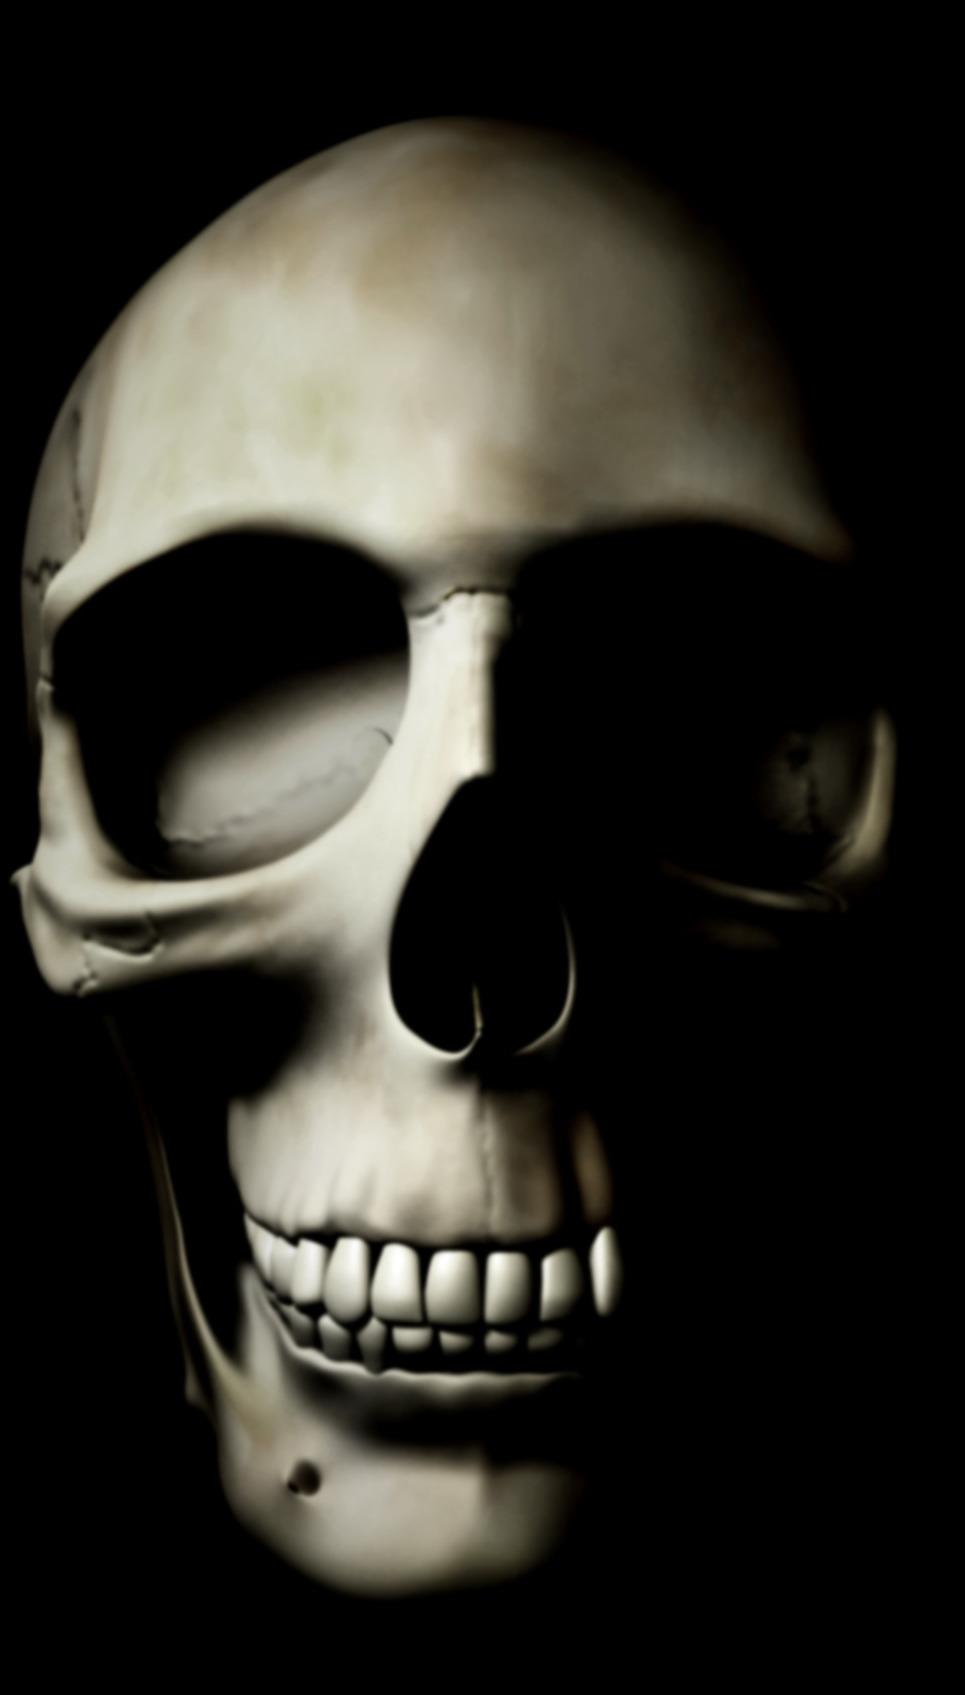 Craniul vedere frontala01 show